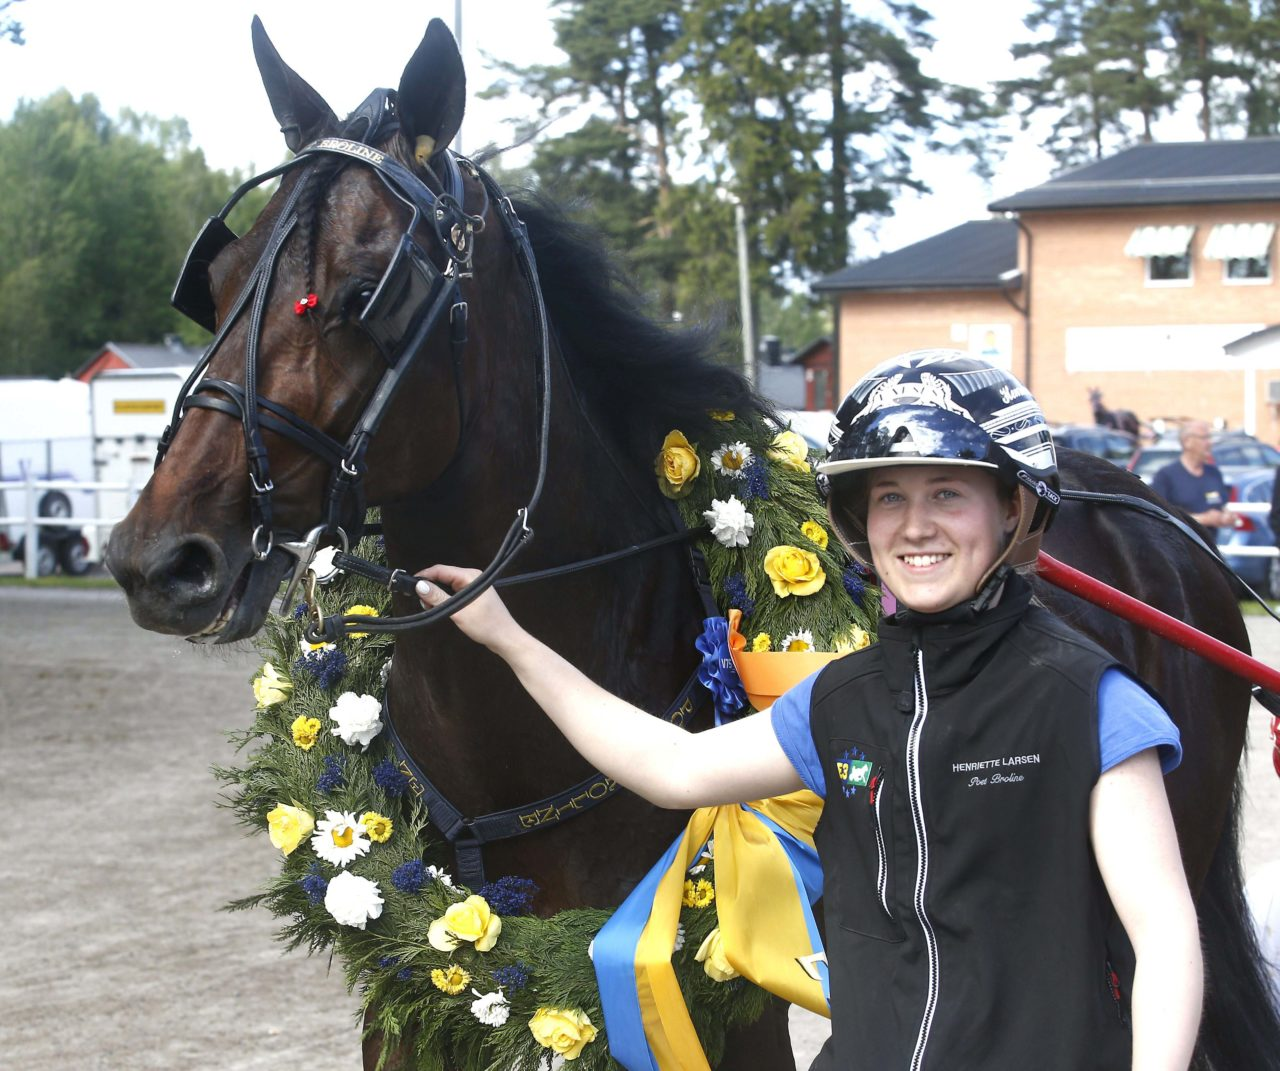 Poet Broline med skötare Henriette Larsen, Sulkysport, Travsport